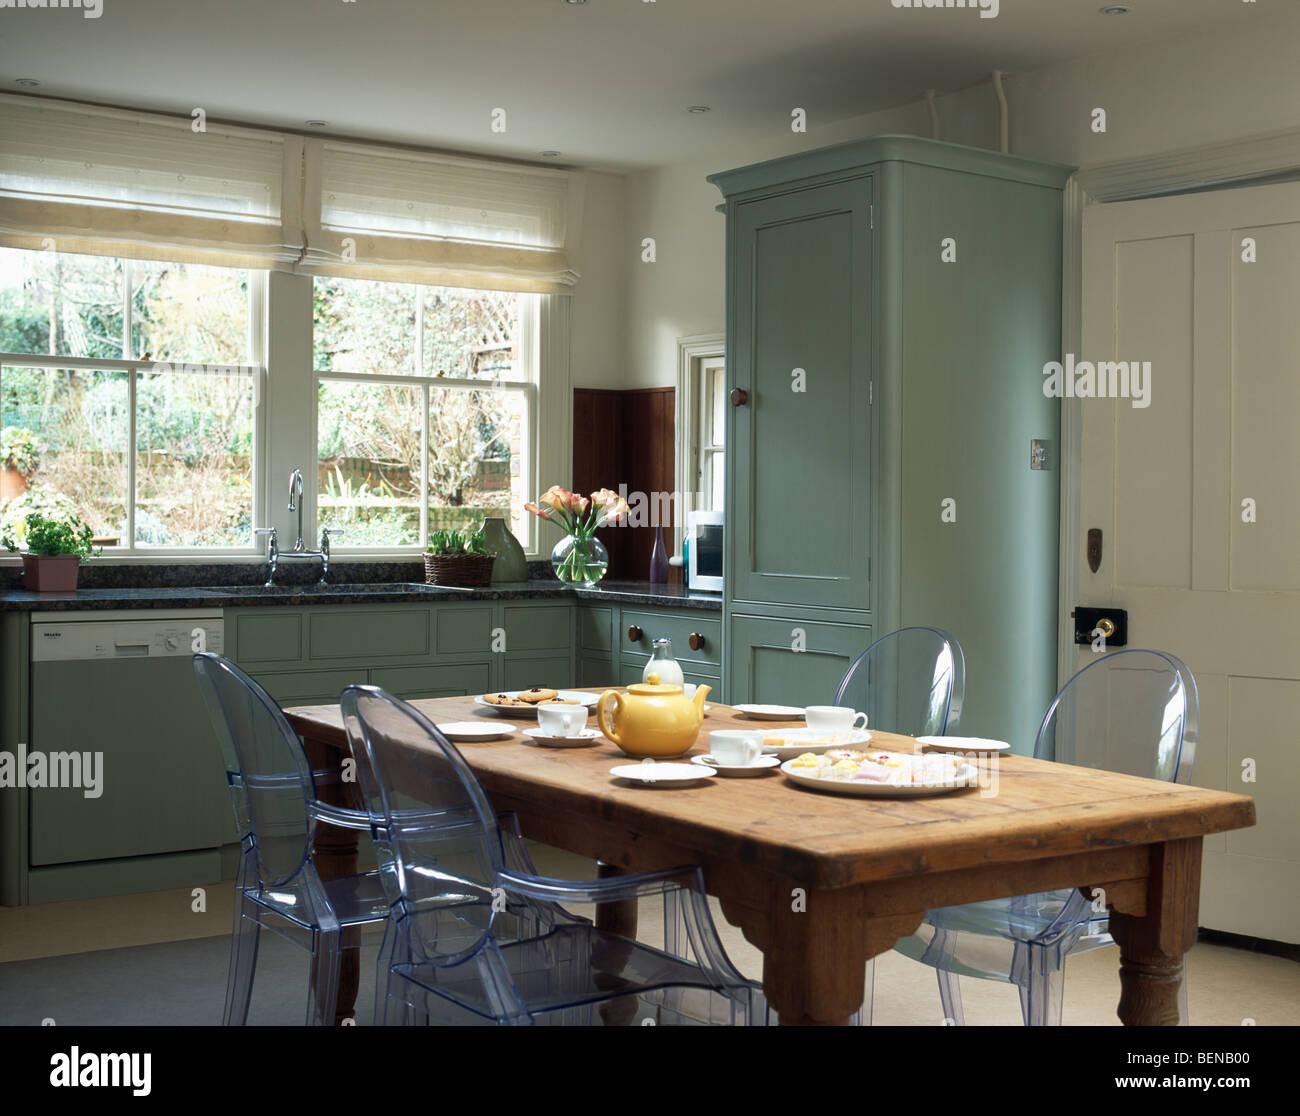 Philippe Starck Ghost sedie a pino antico tavolo in cucina di paese ...